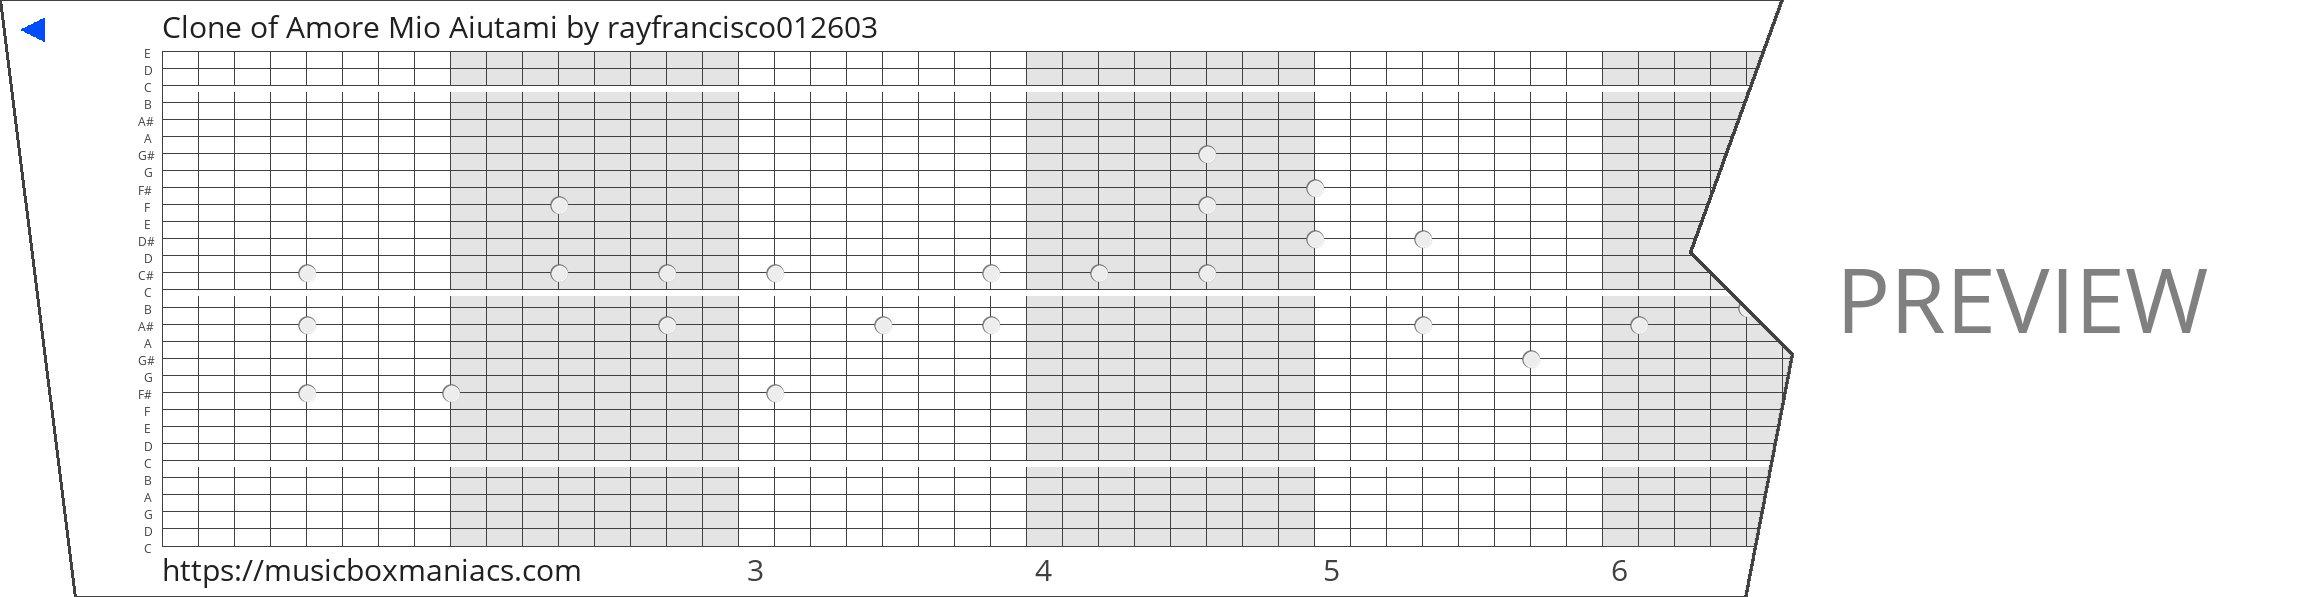 Clone of Amore Mio Aiutami 30 note music box paper strip